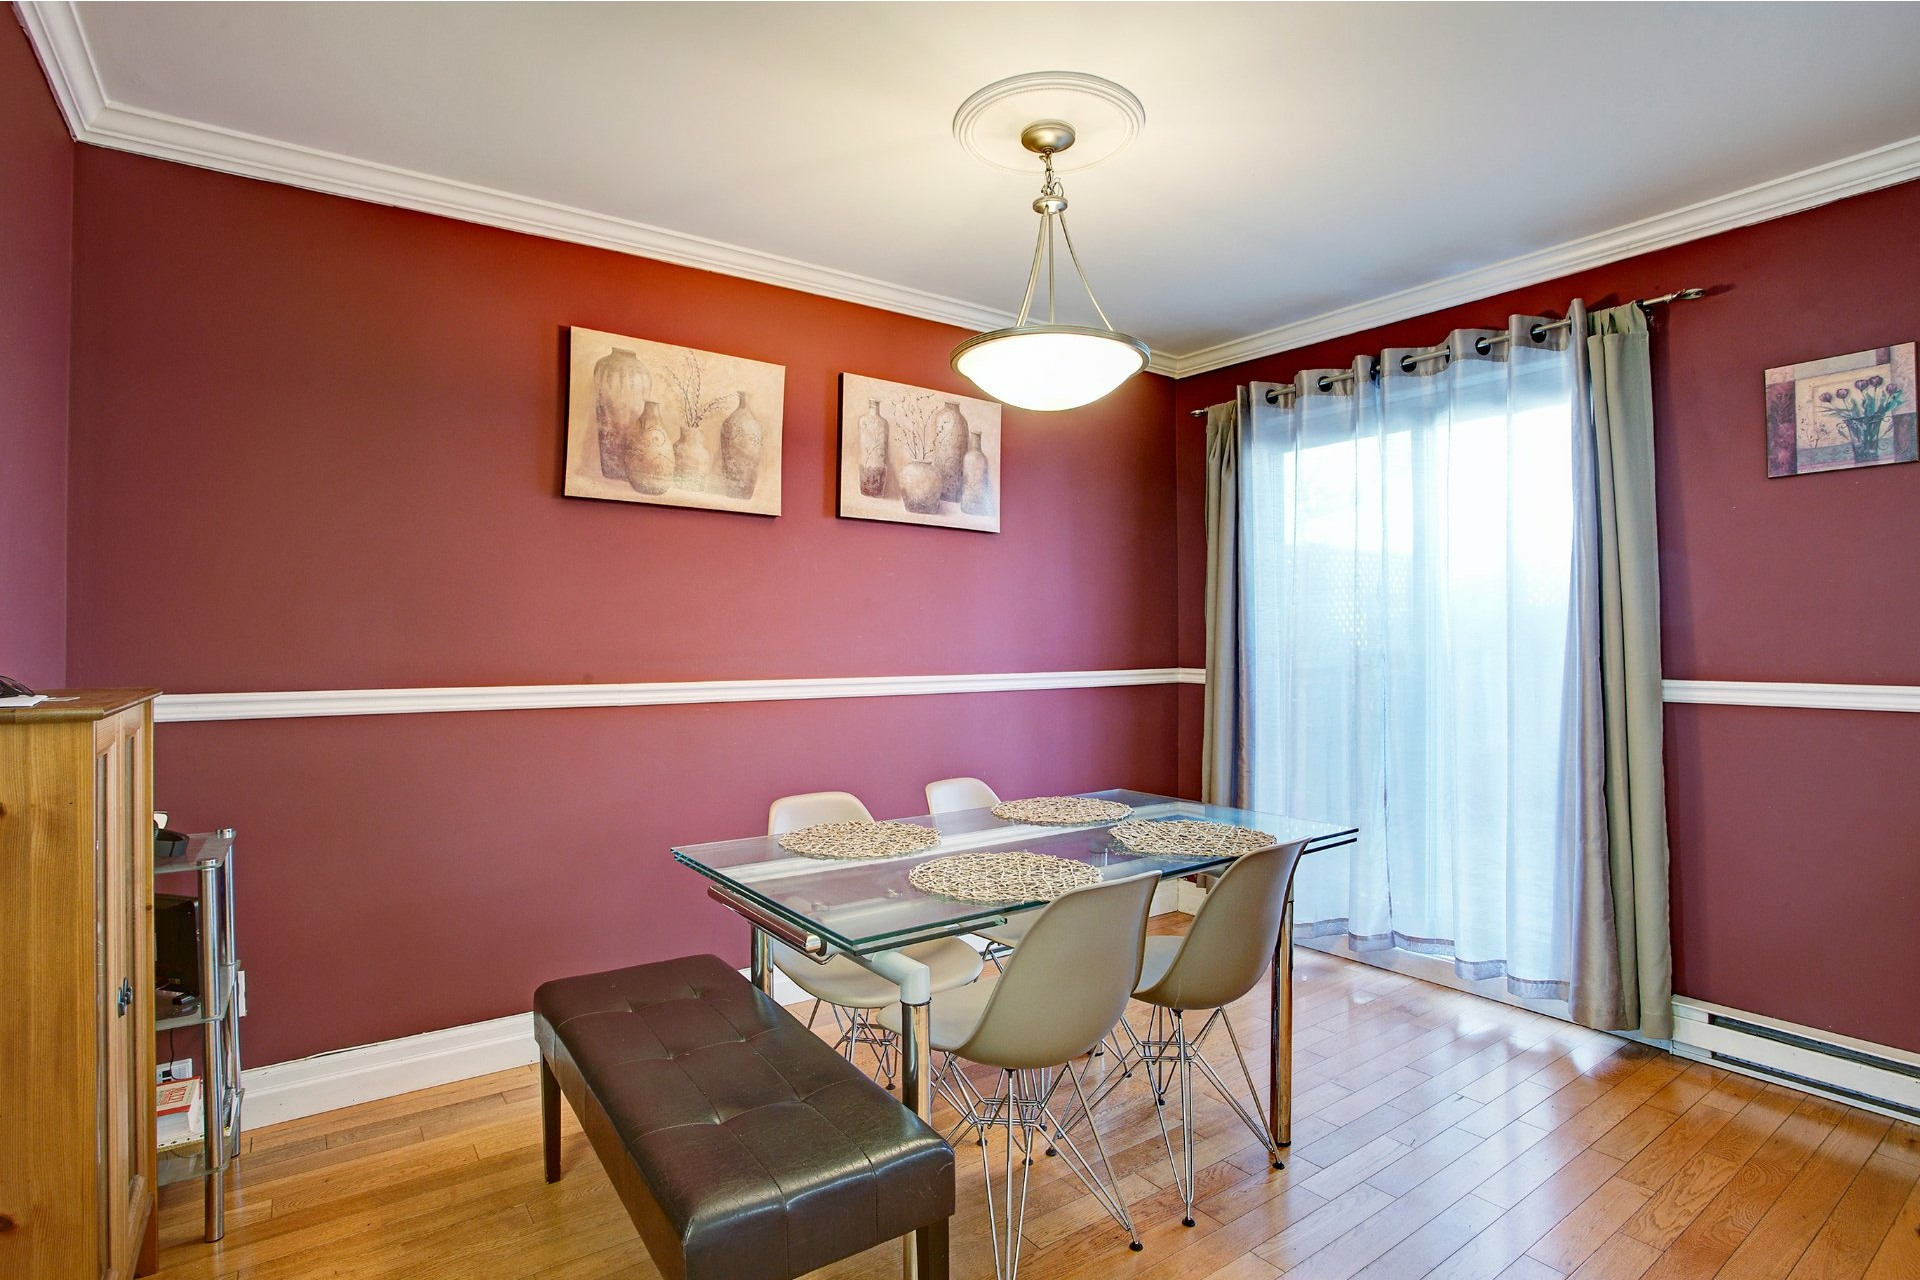 image 6 - MX - Casa sola - MX En venta Lachine Montréal  - 10 habitaciones